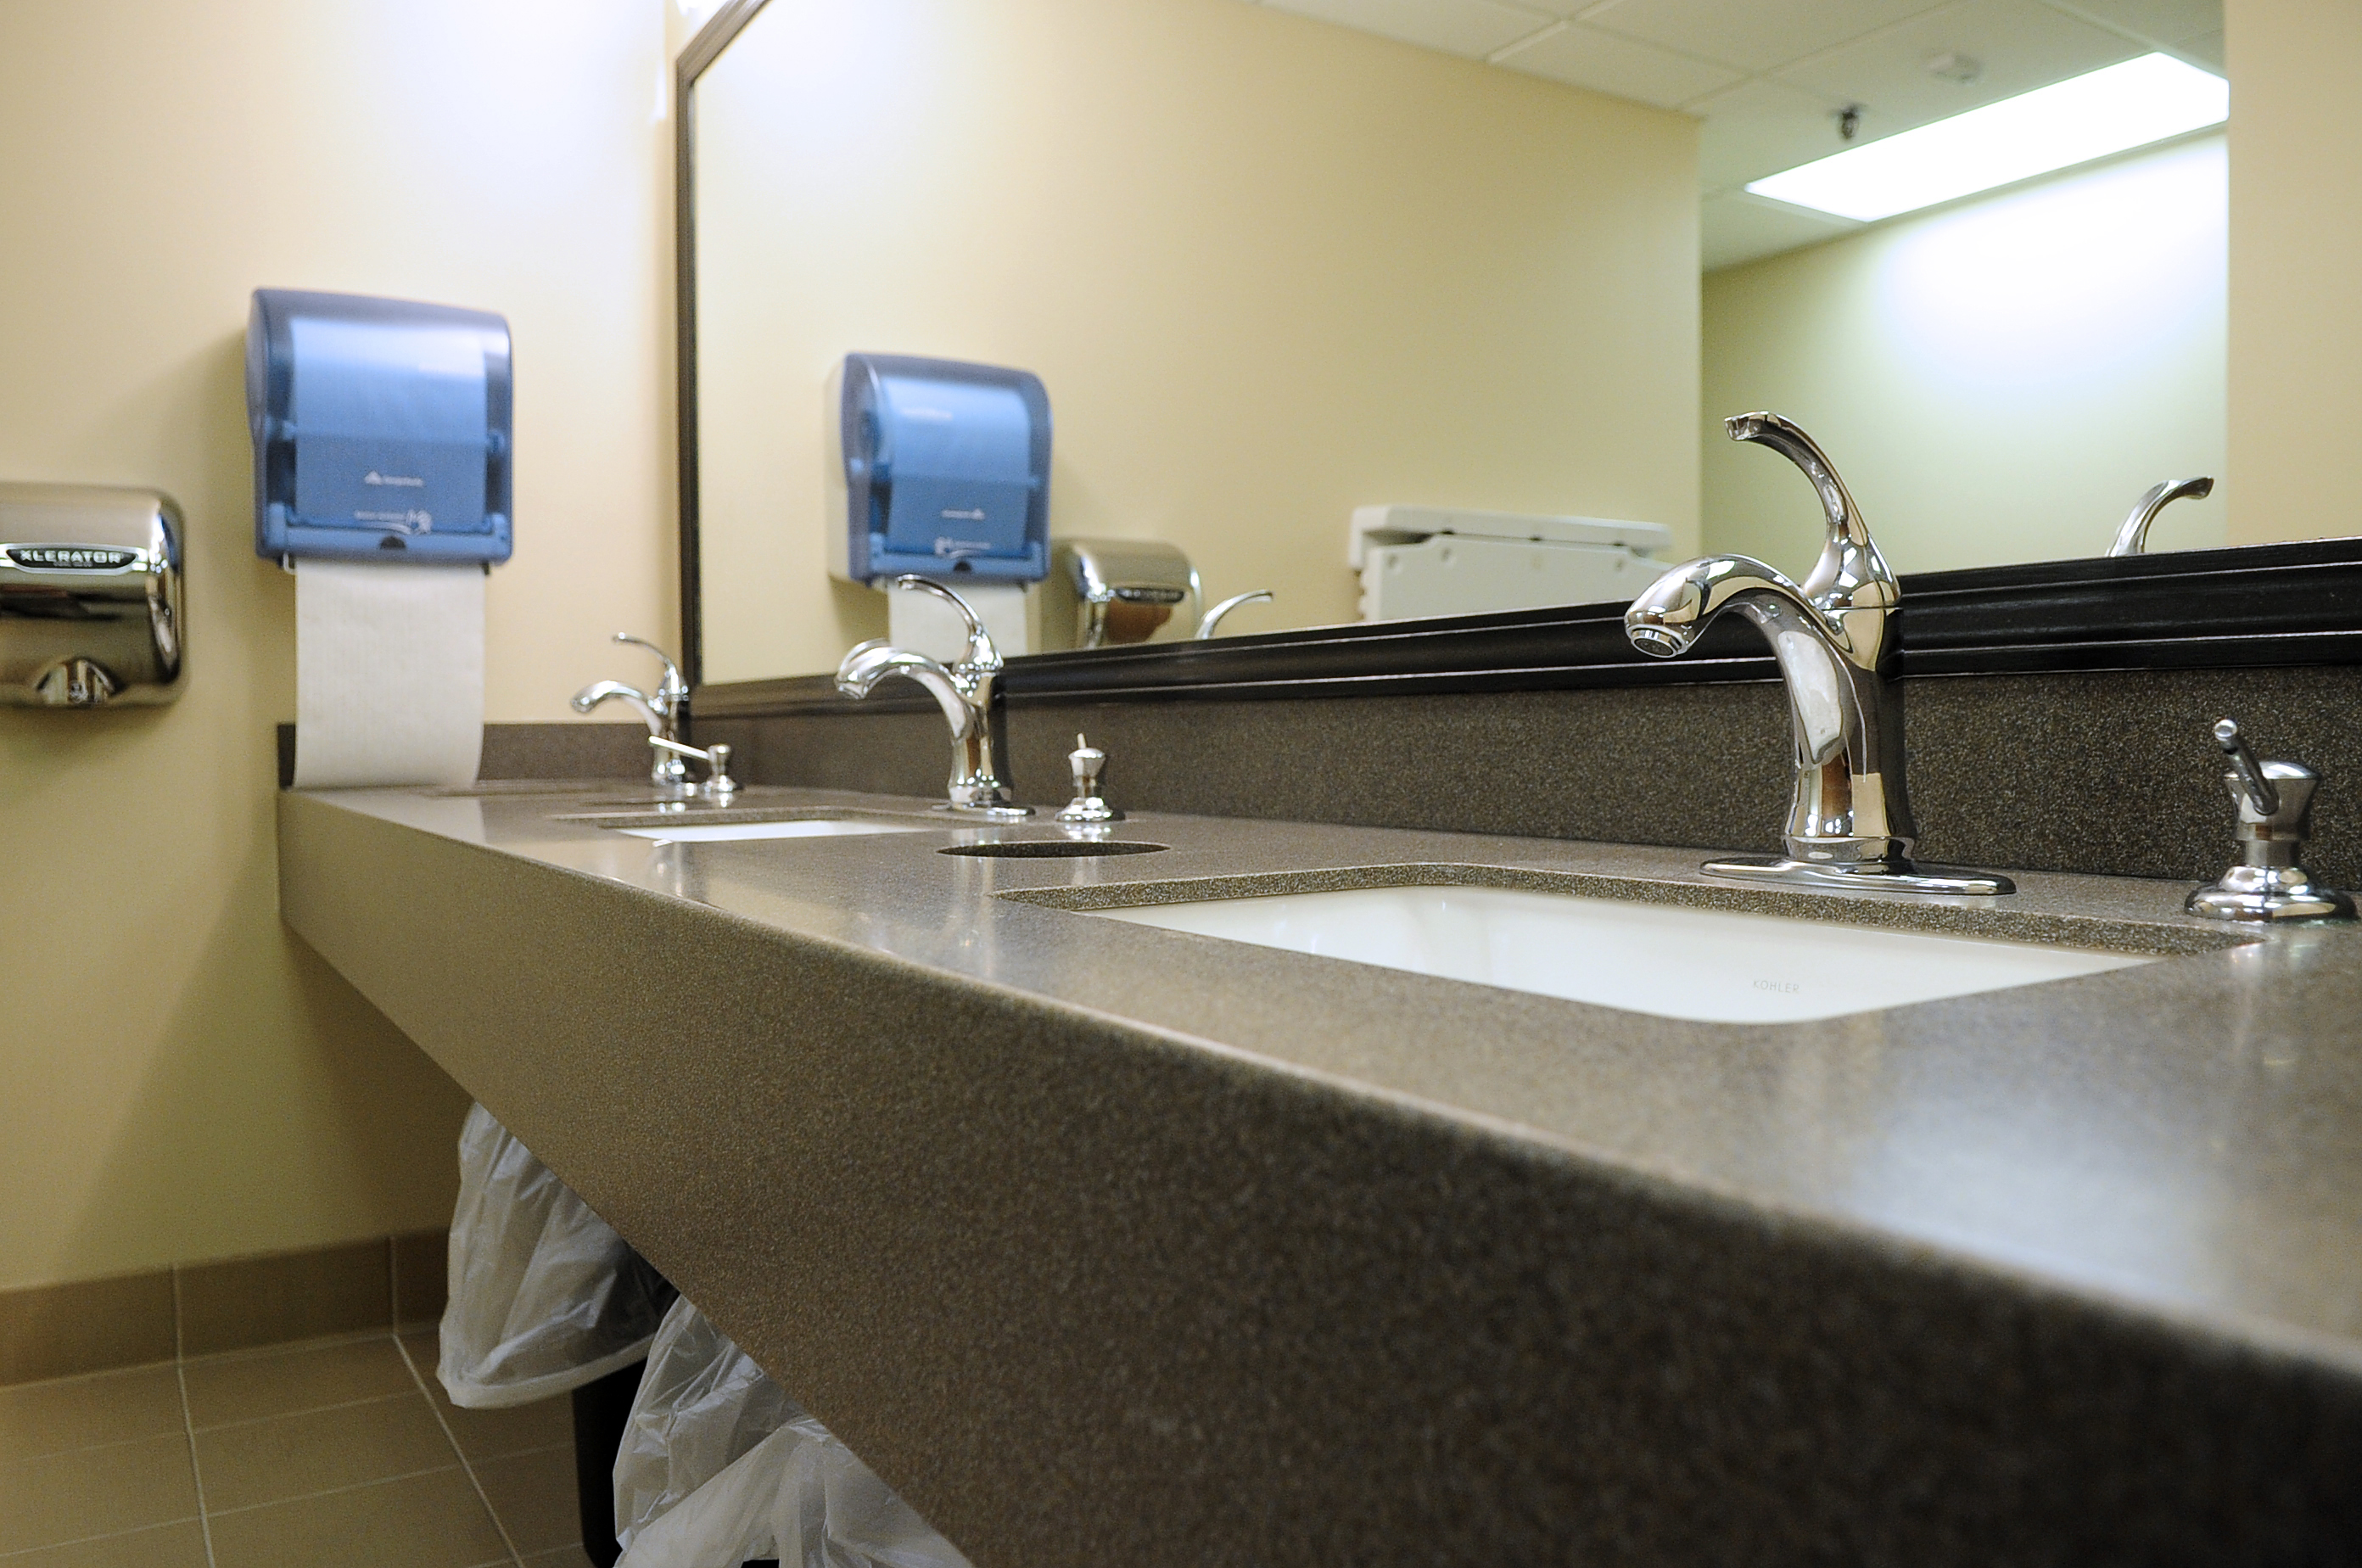 Essential tips to plan bathroom renovations